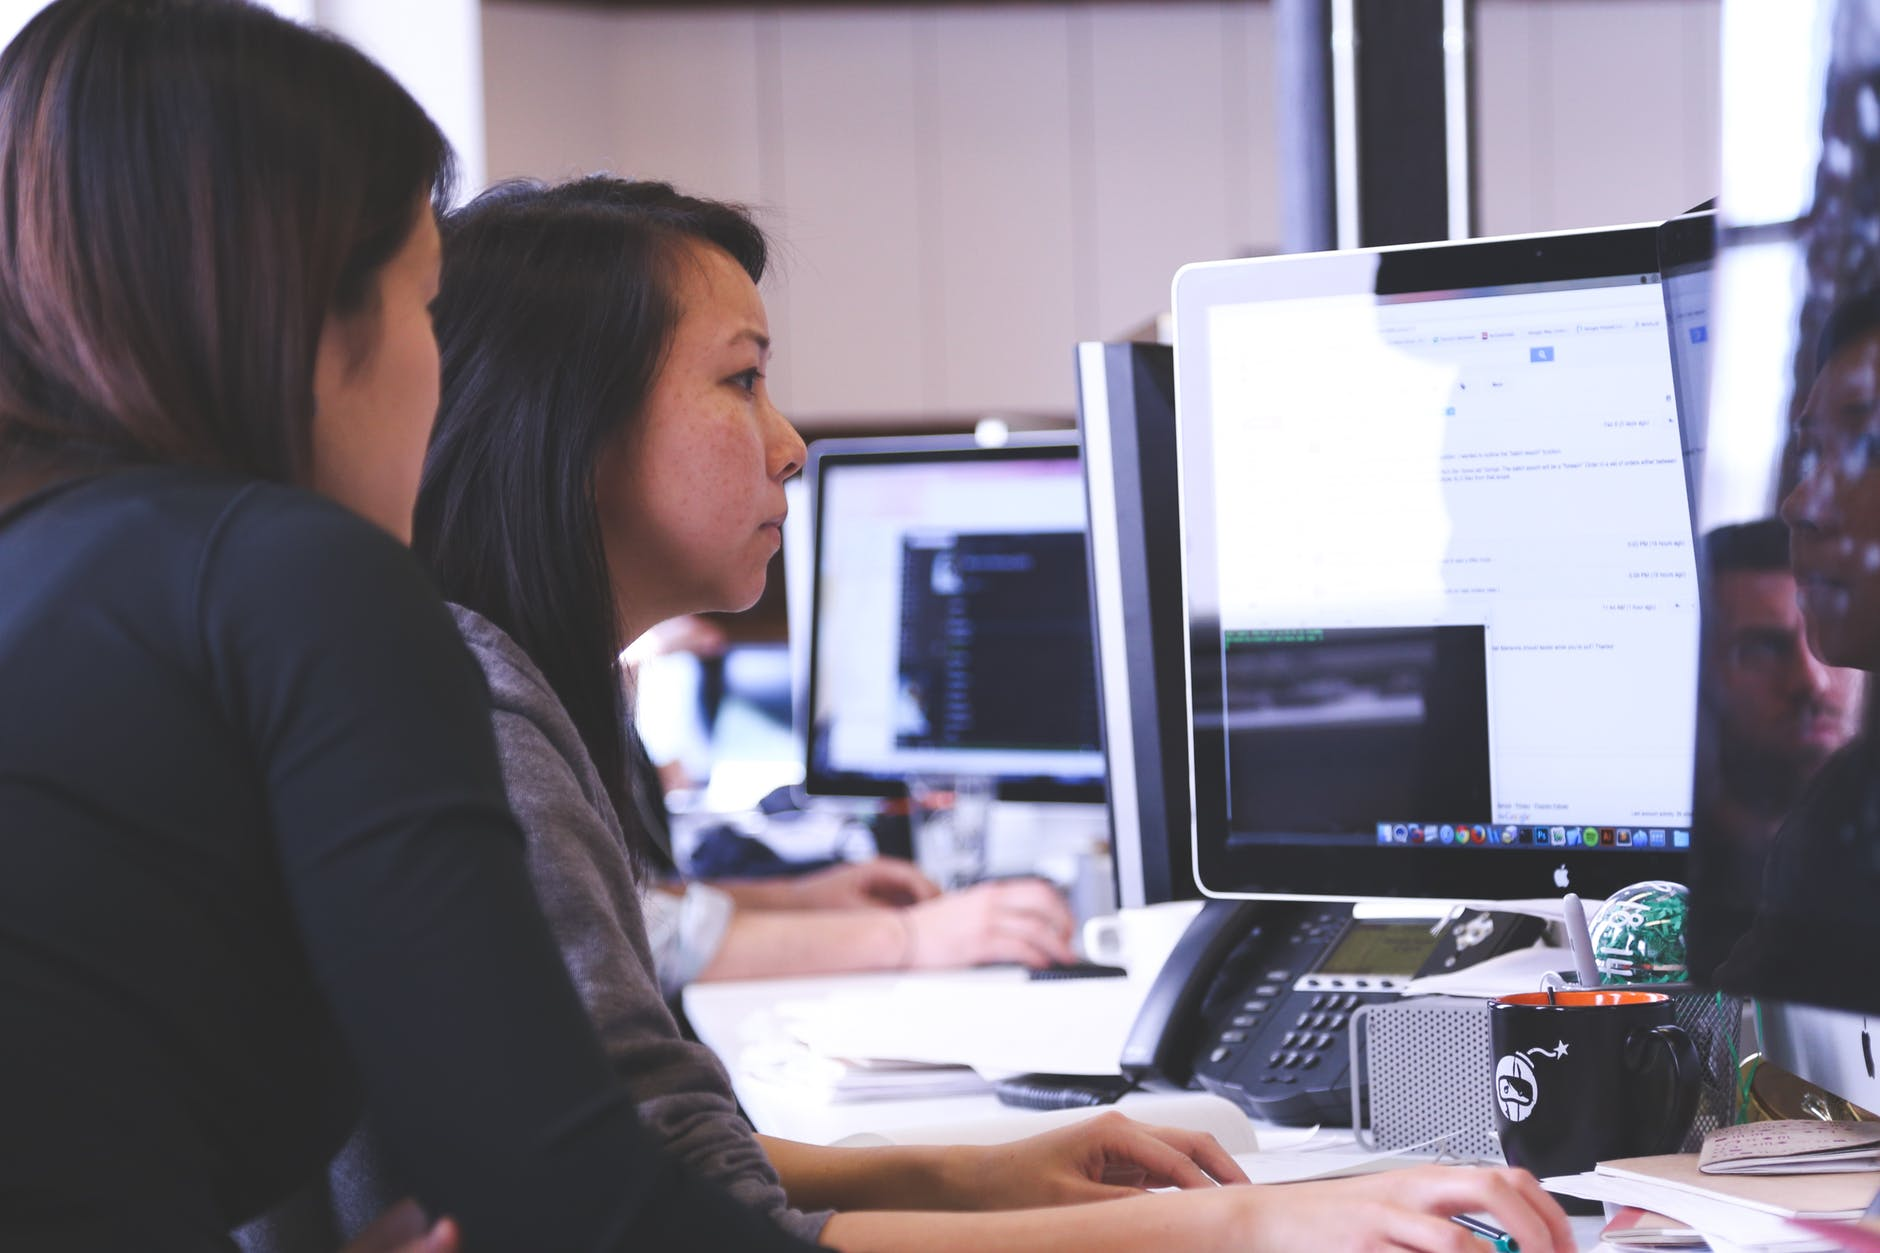 Essential Digital Skills for Work Level 1